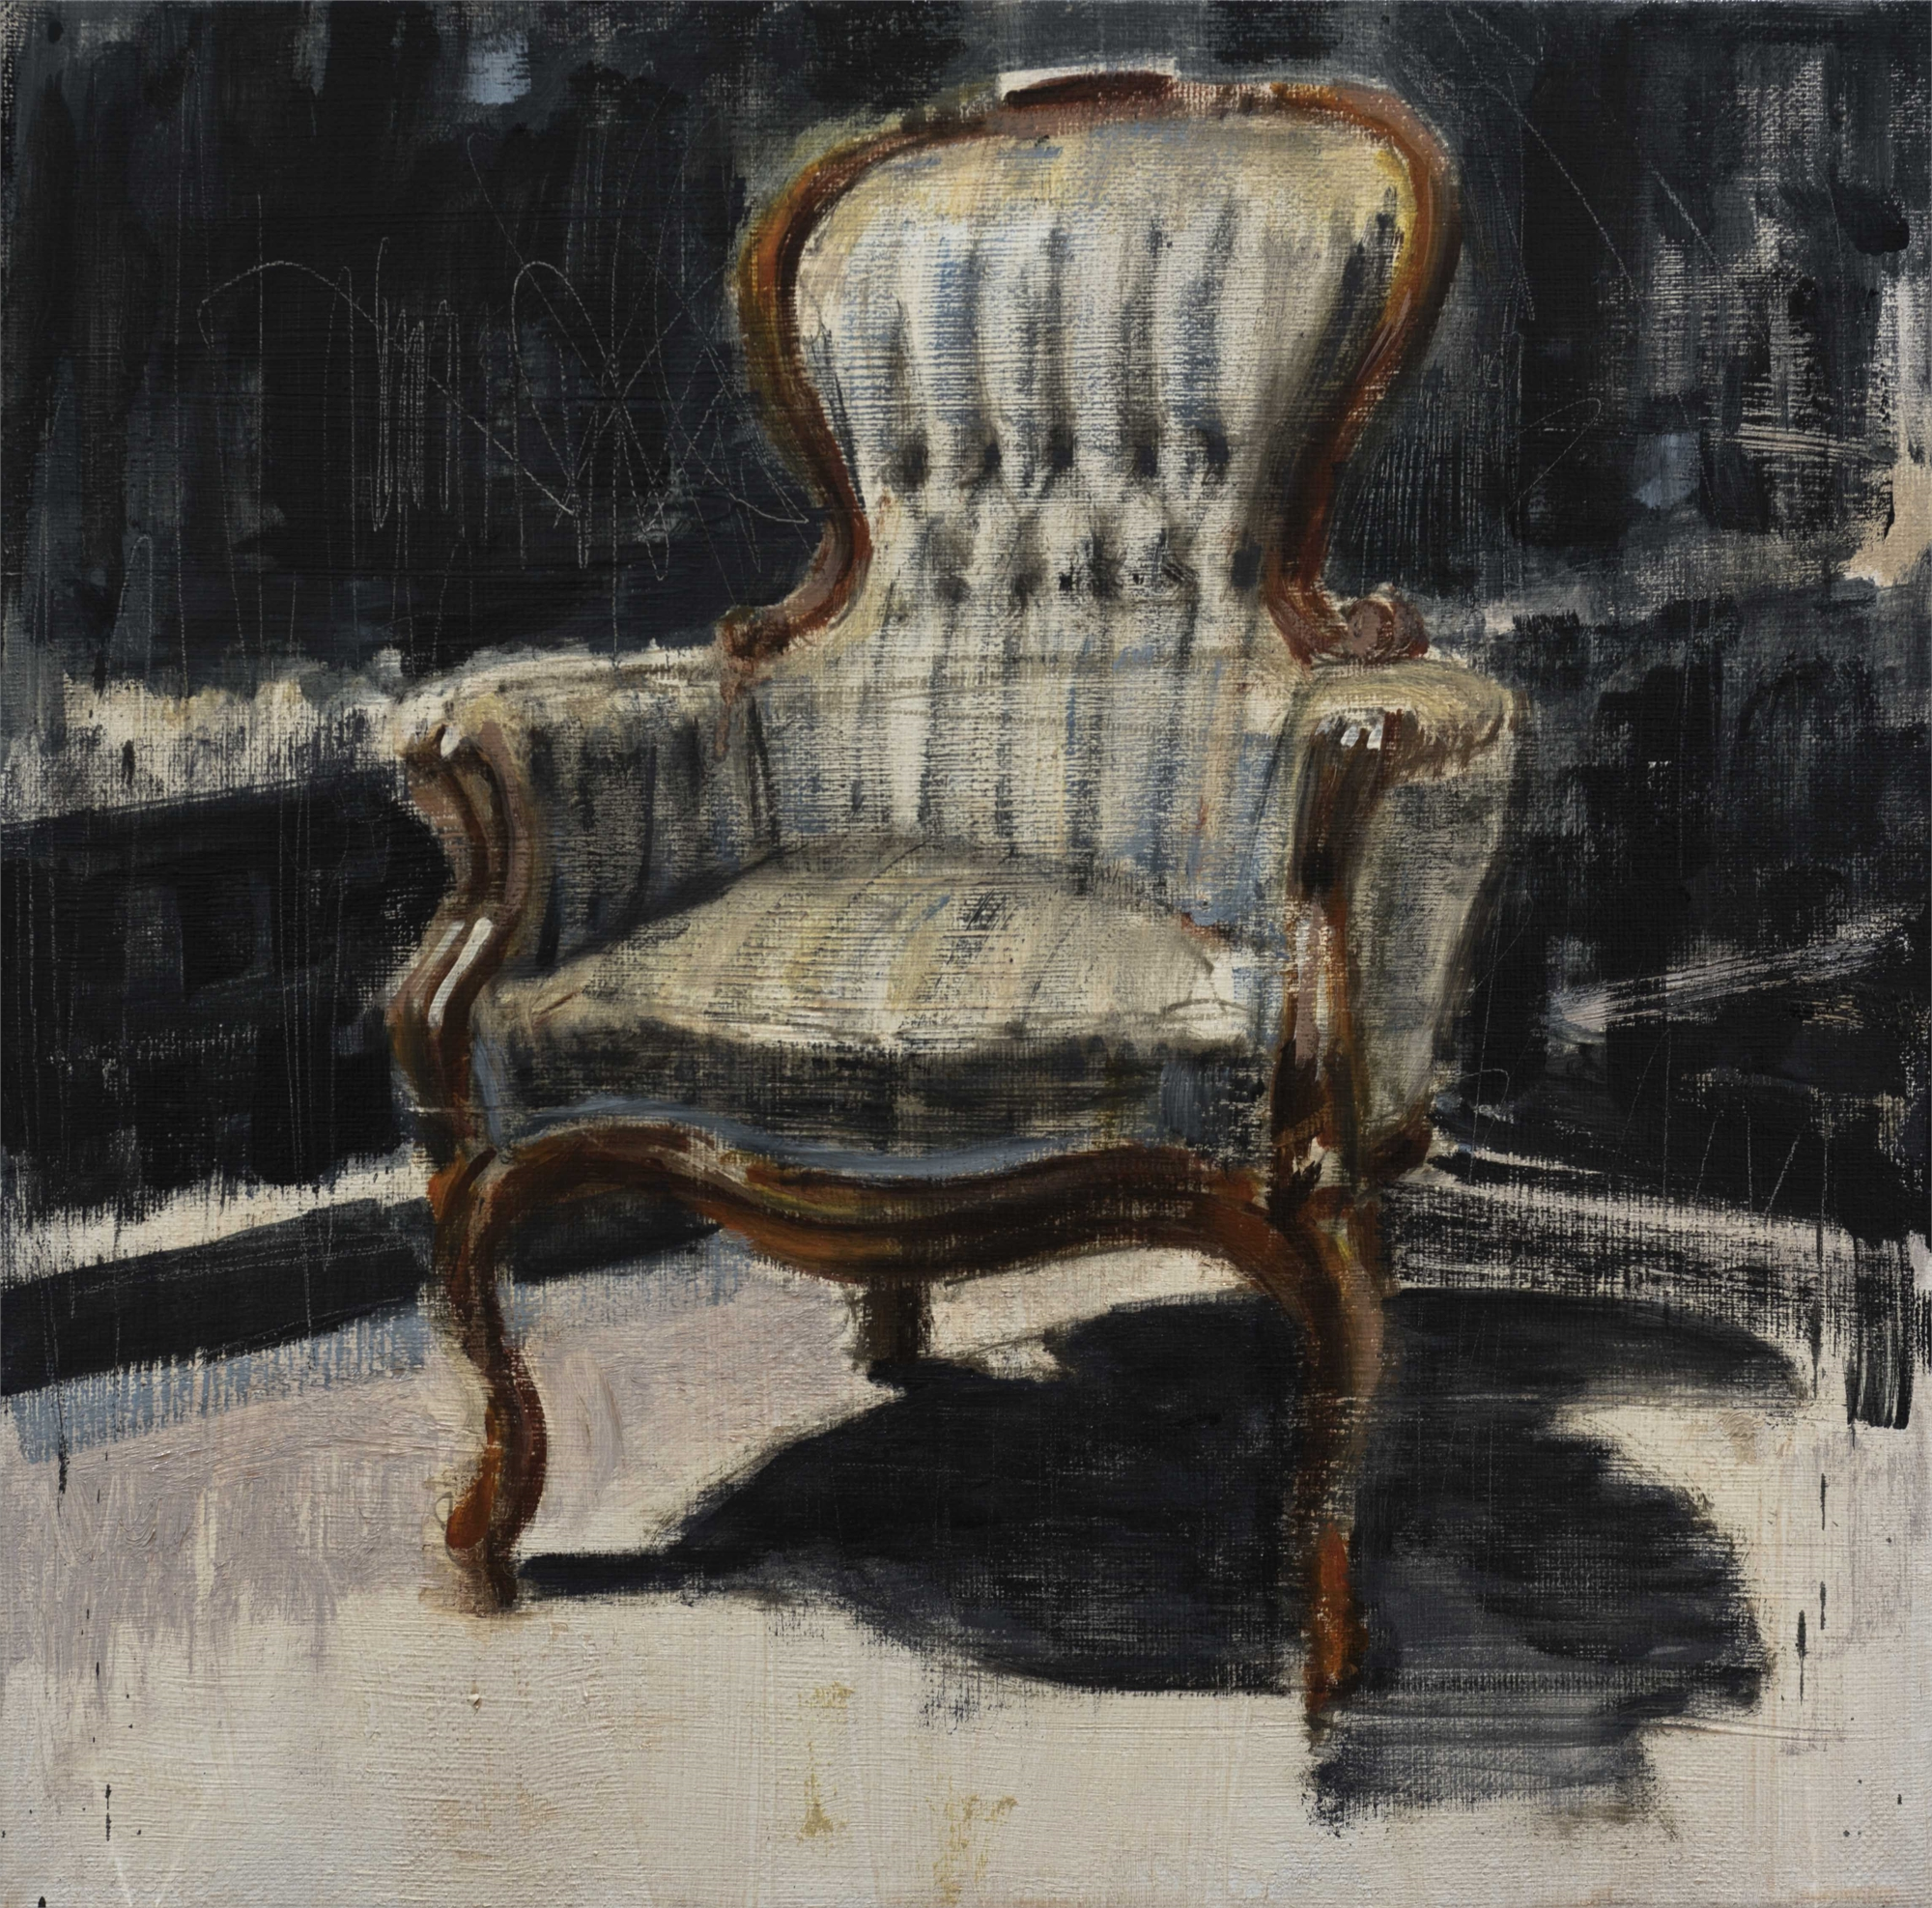 Studio di Poltrona by Valerio D'Ospina